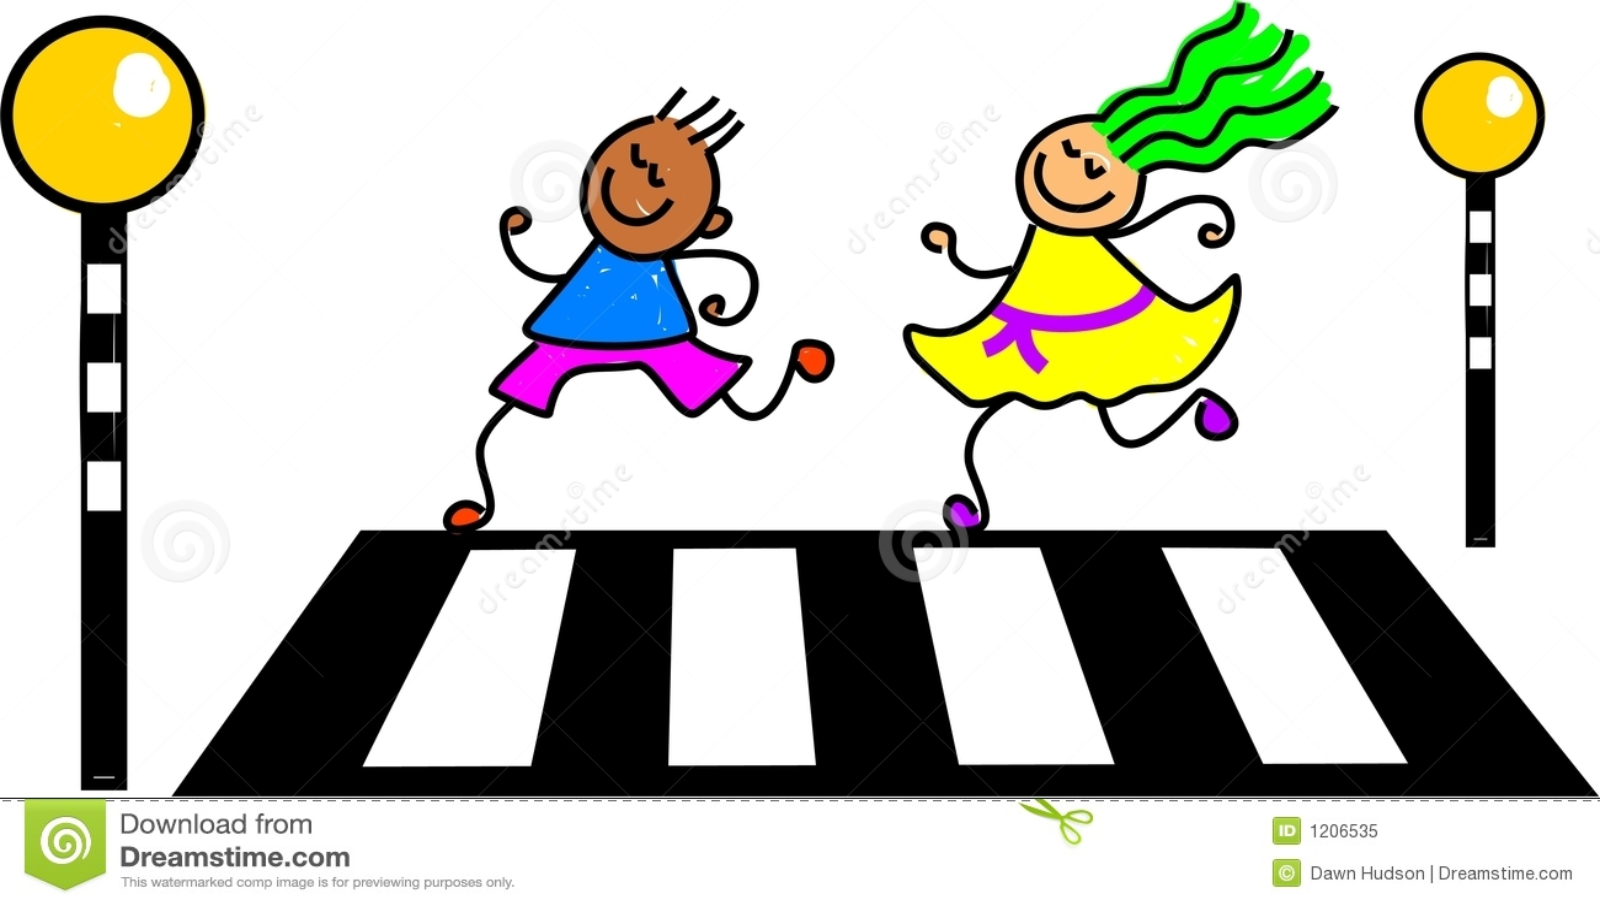 Kids crossing the road at a zebra crossing - toddler art series.